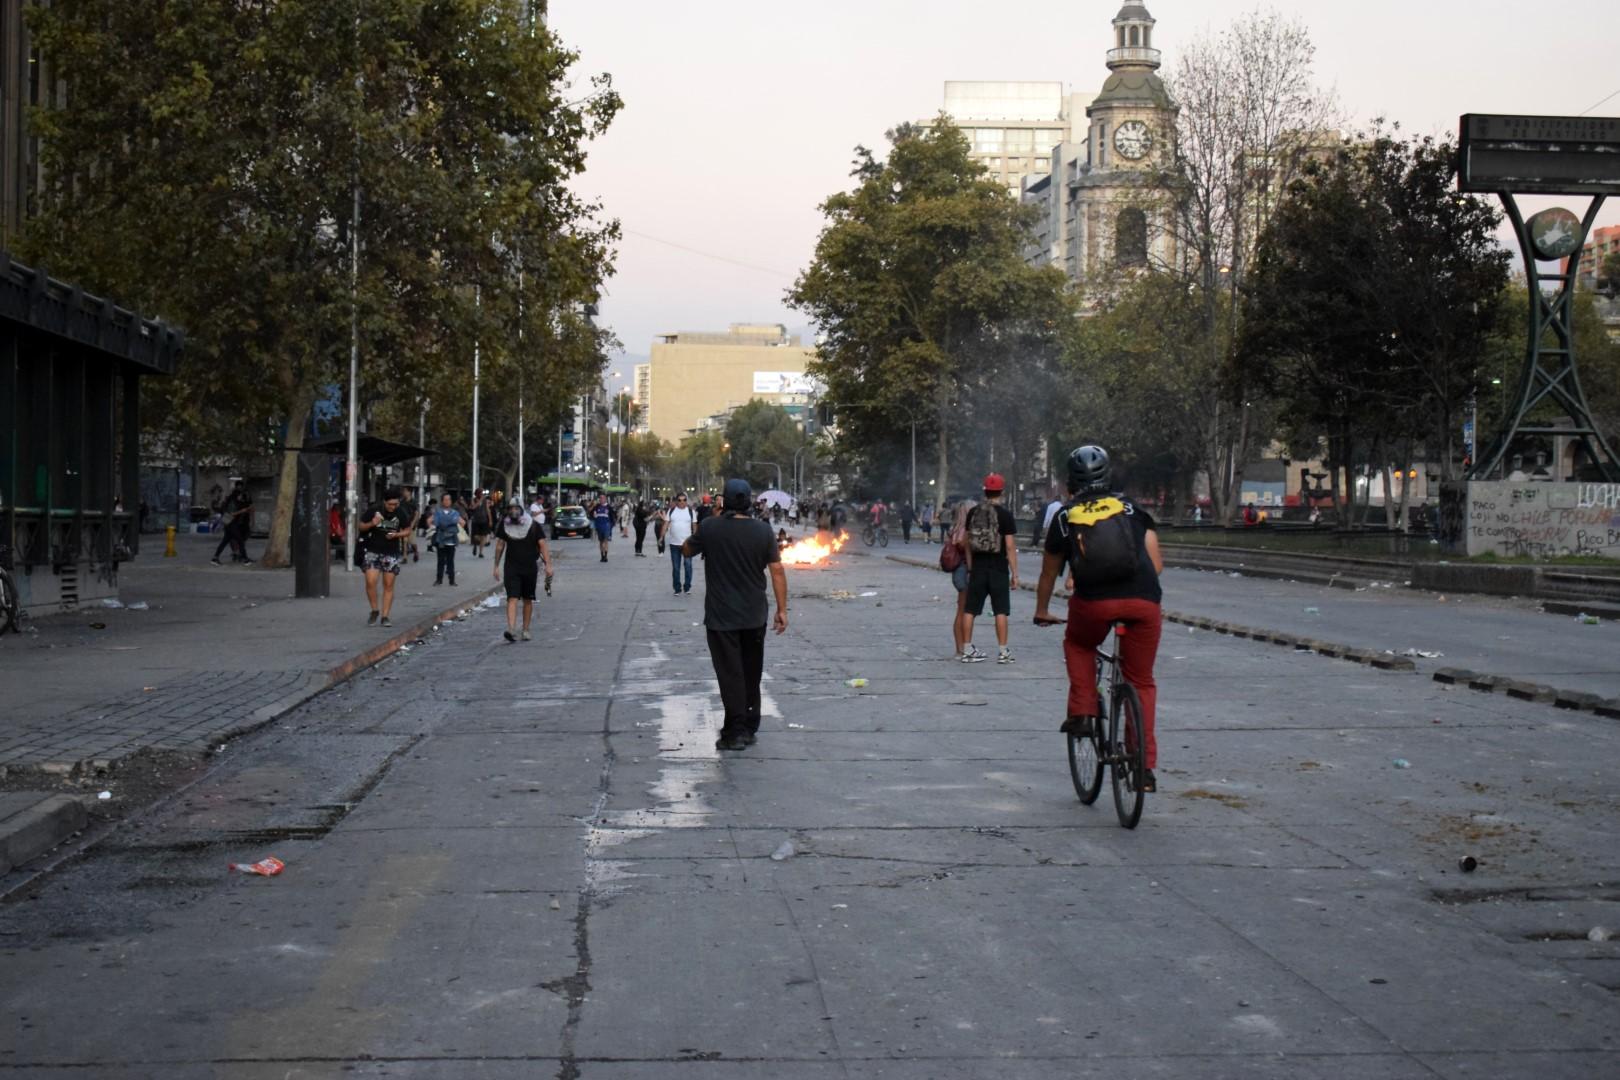 La Alameda, protests on March 14, 2020